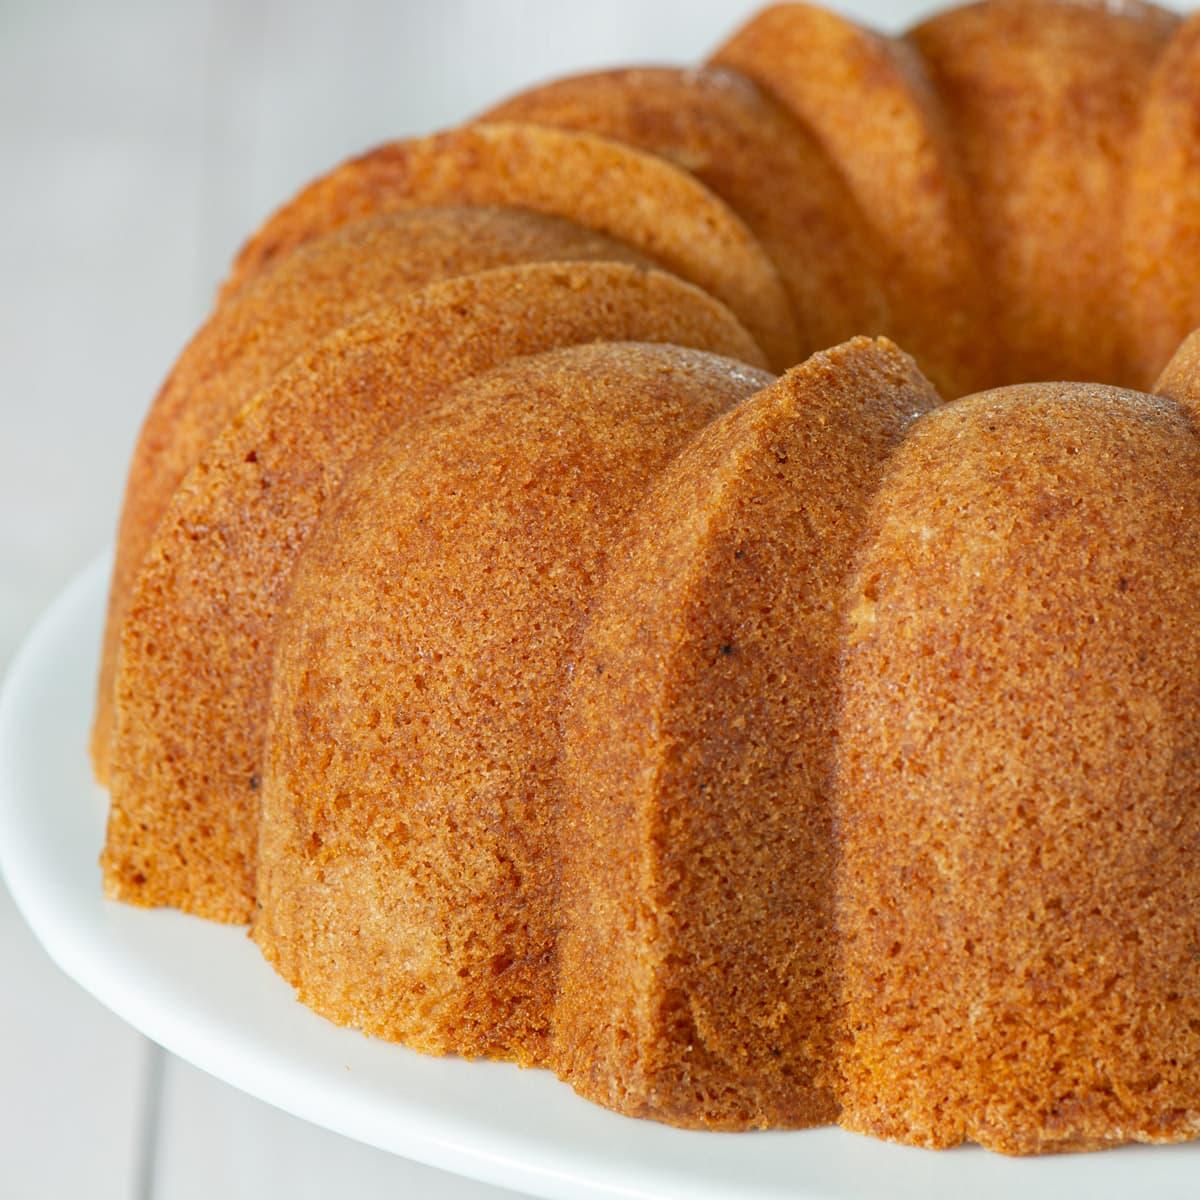 A plain bundt cake.